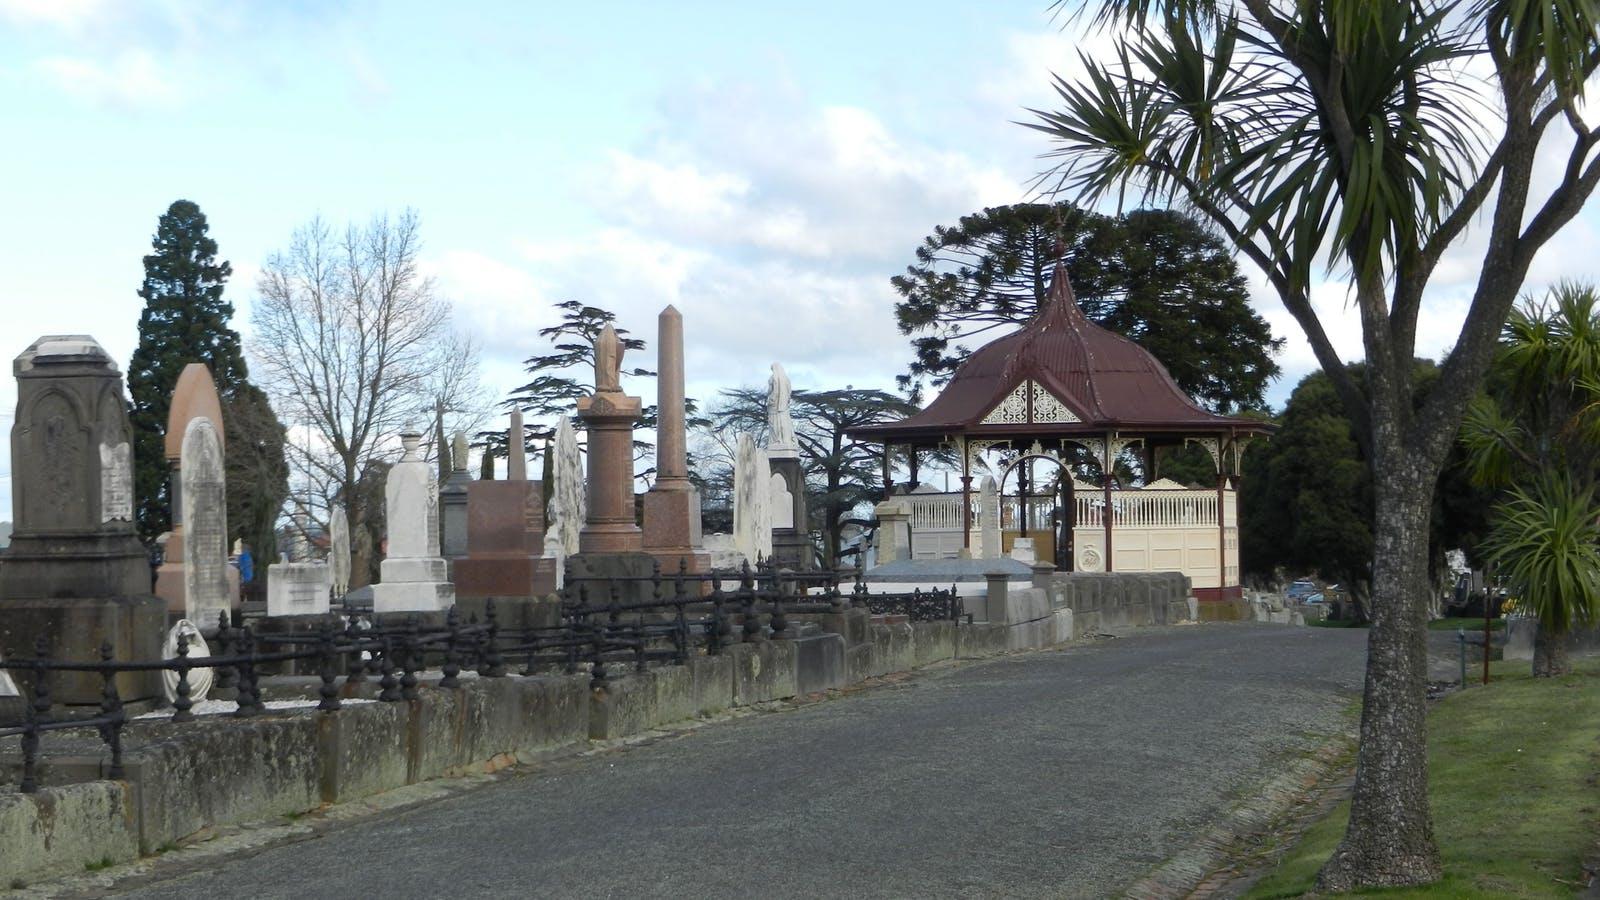 Historic Rotunda